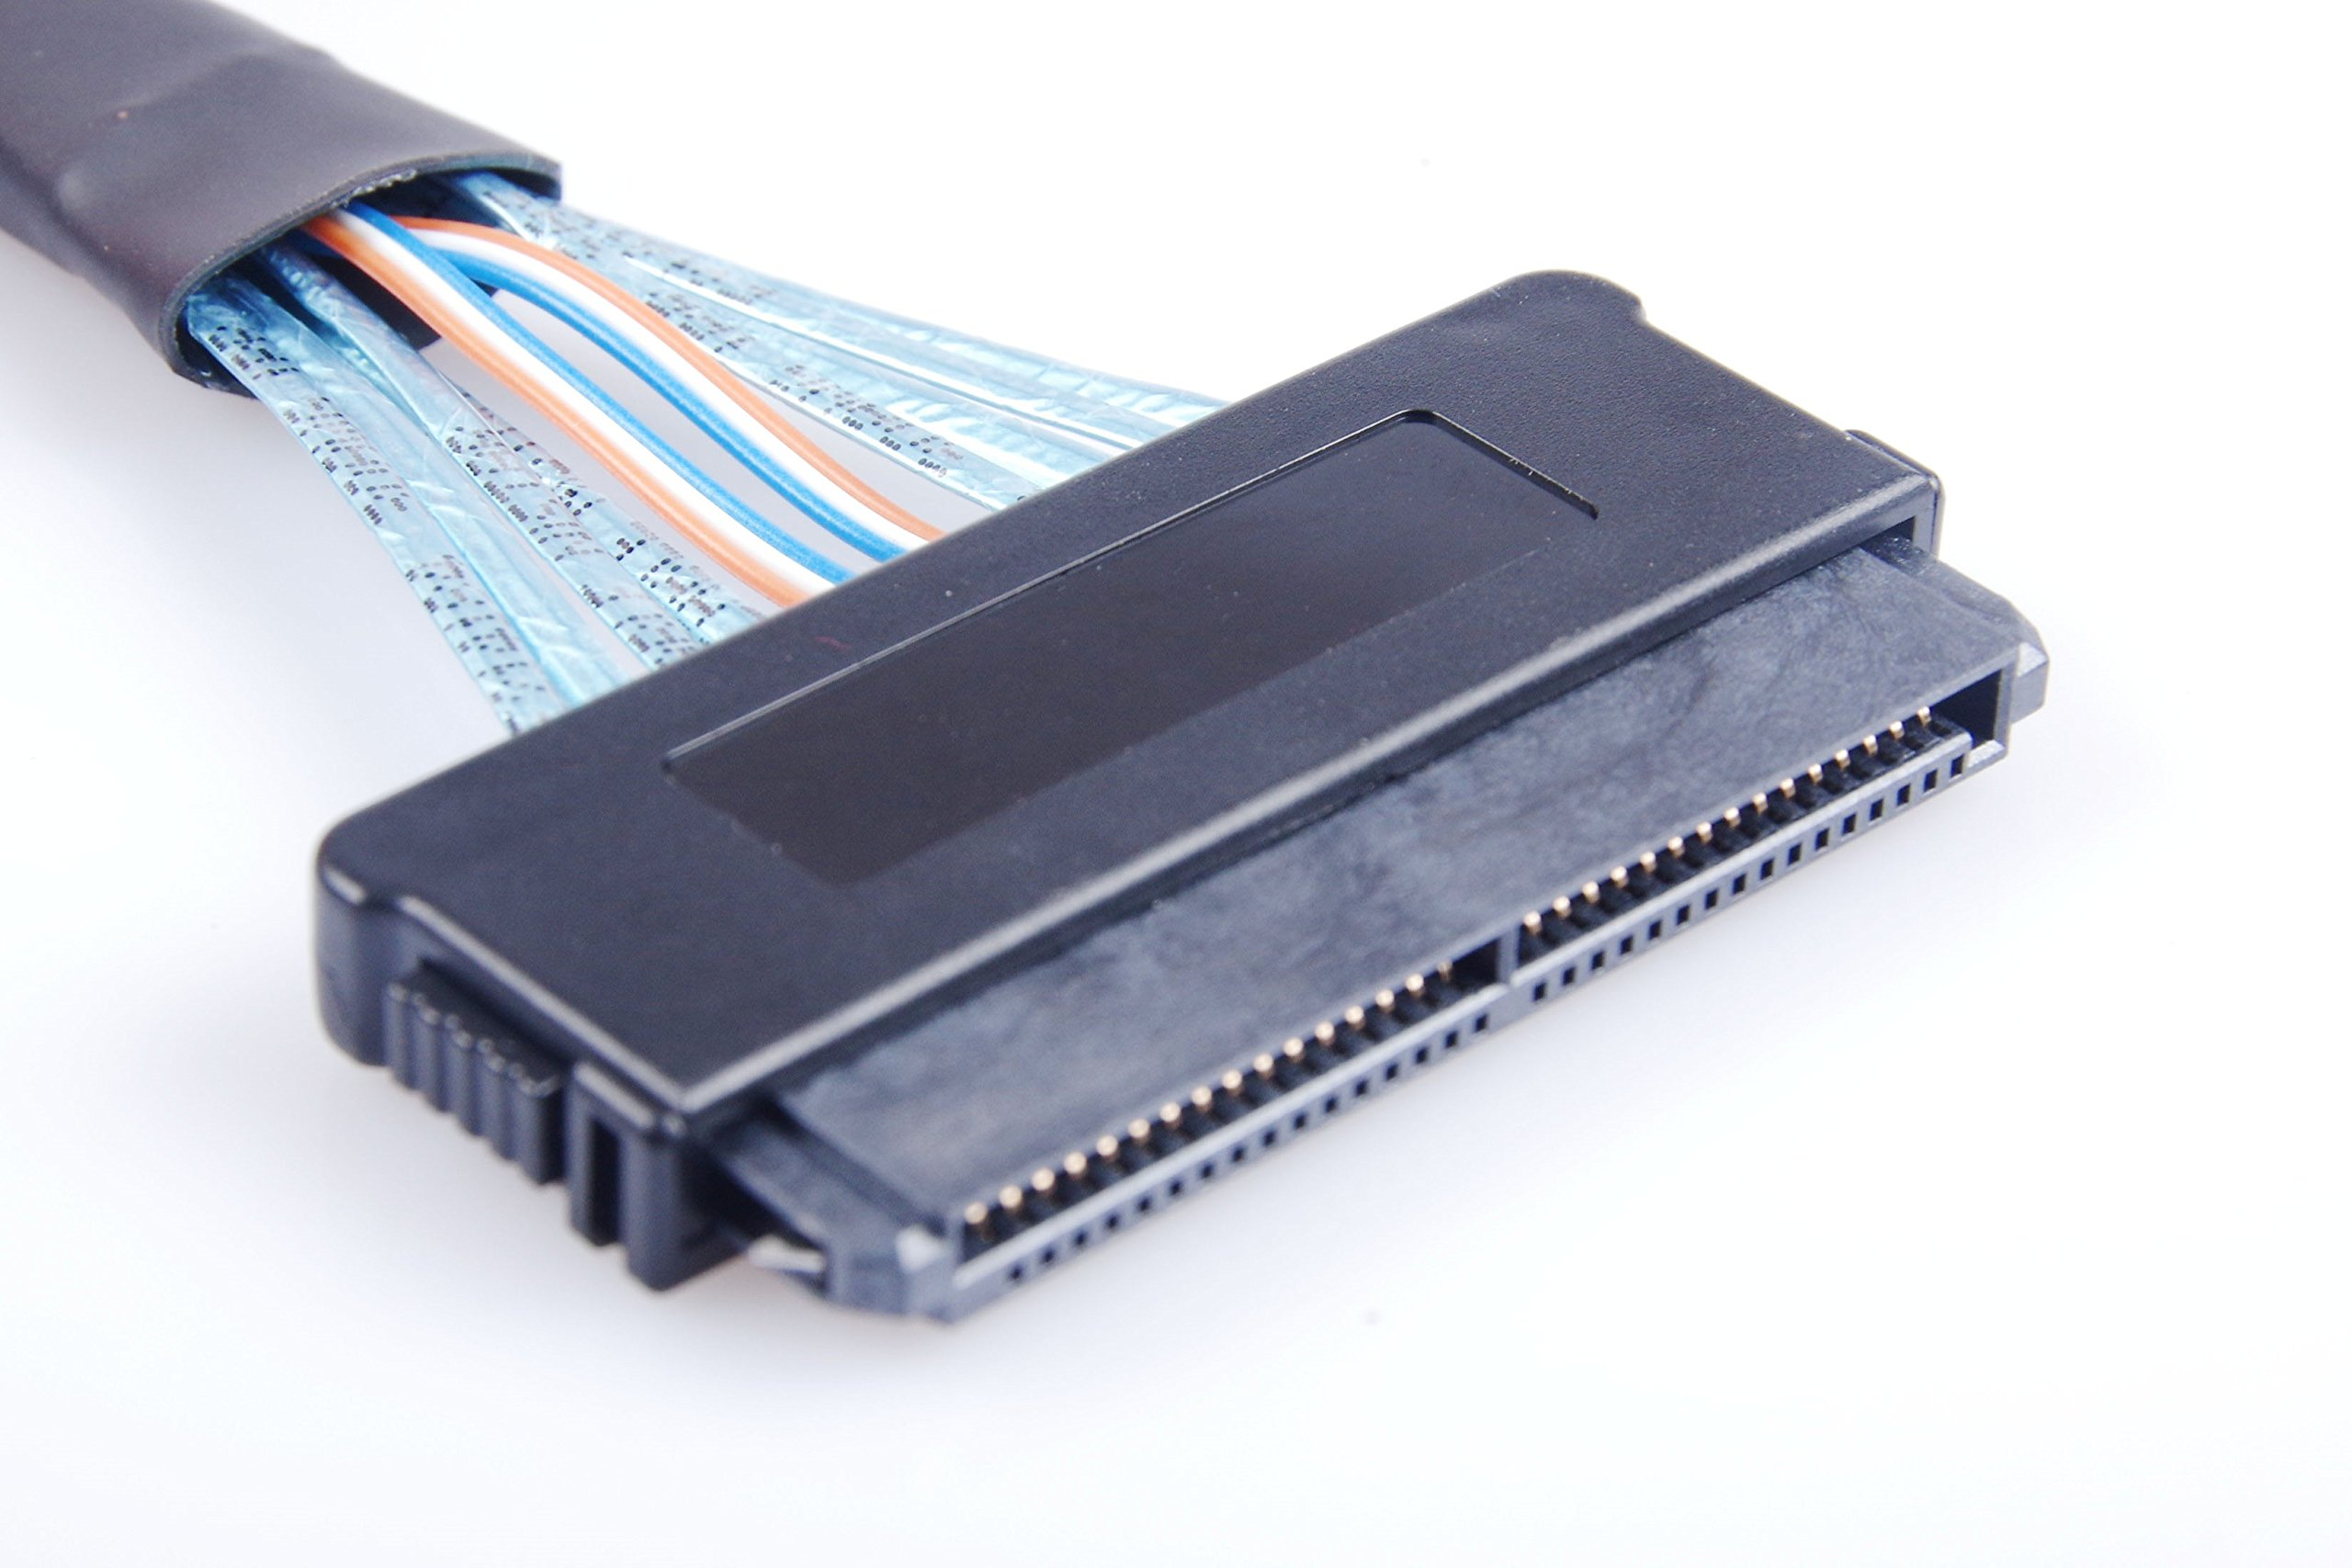 KNACRO Mini SAS Cable SFF-8087 36Pin to SAS SFF-8484 32pin - SAS Adapter 1.64ft(0.5m by KNACRO (Image #6)